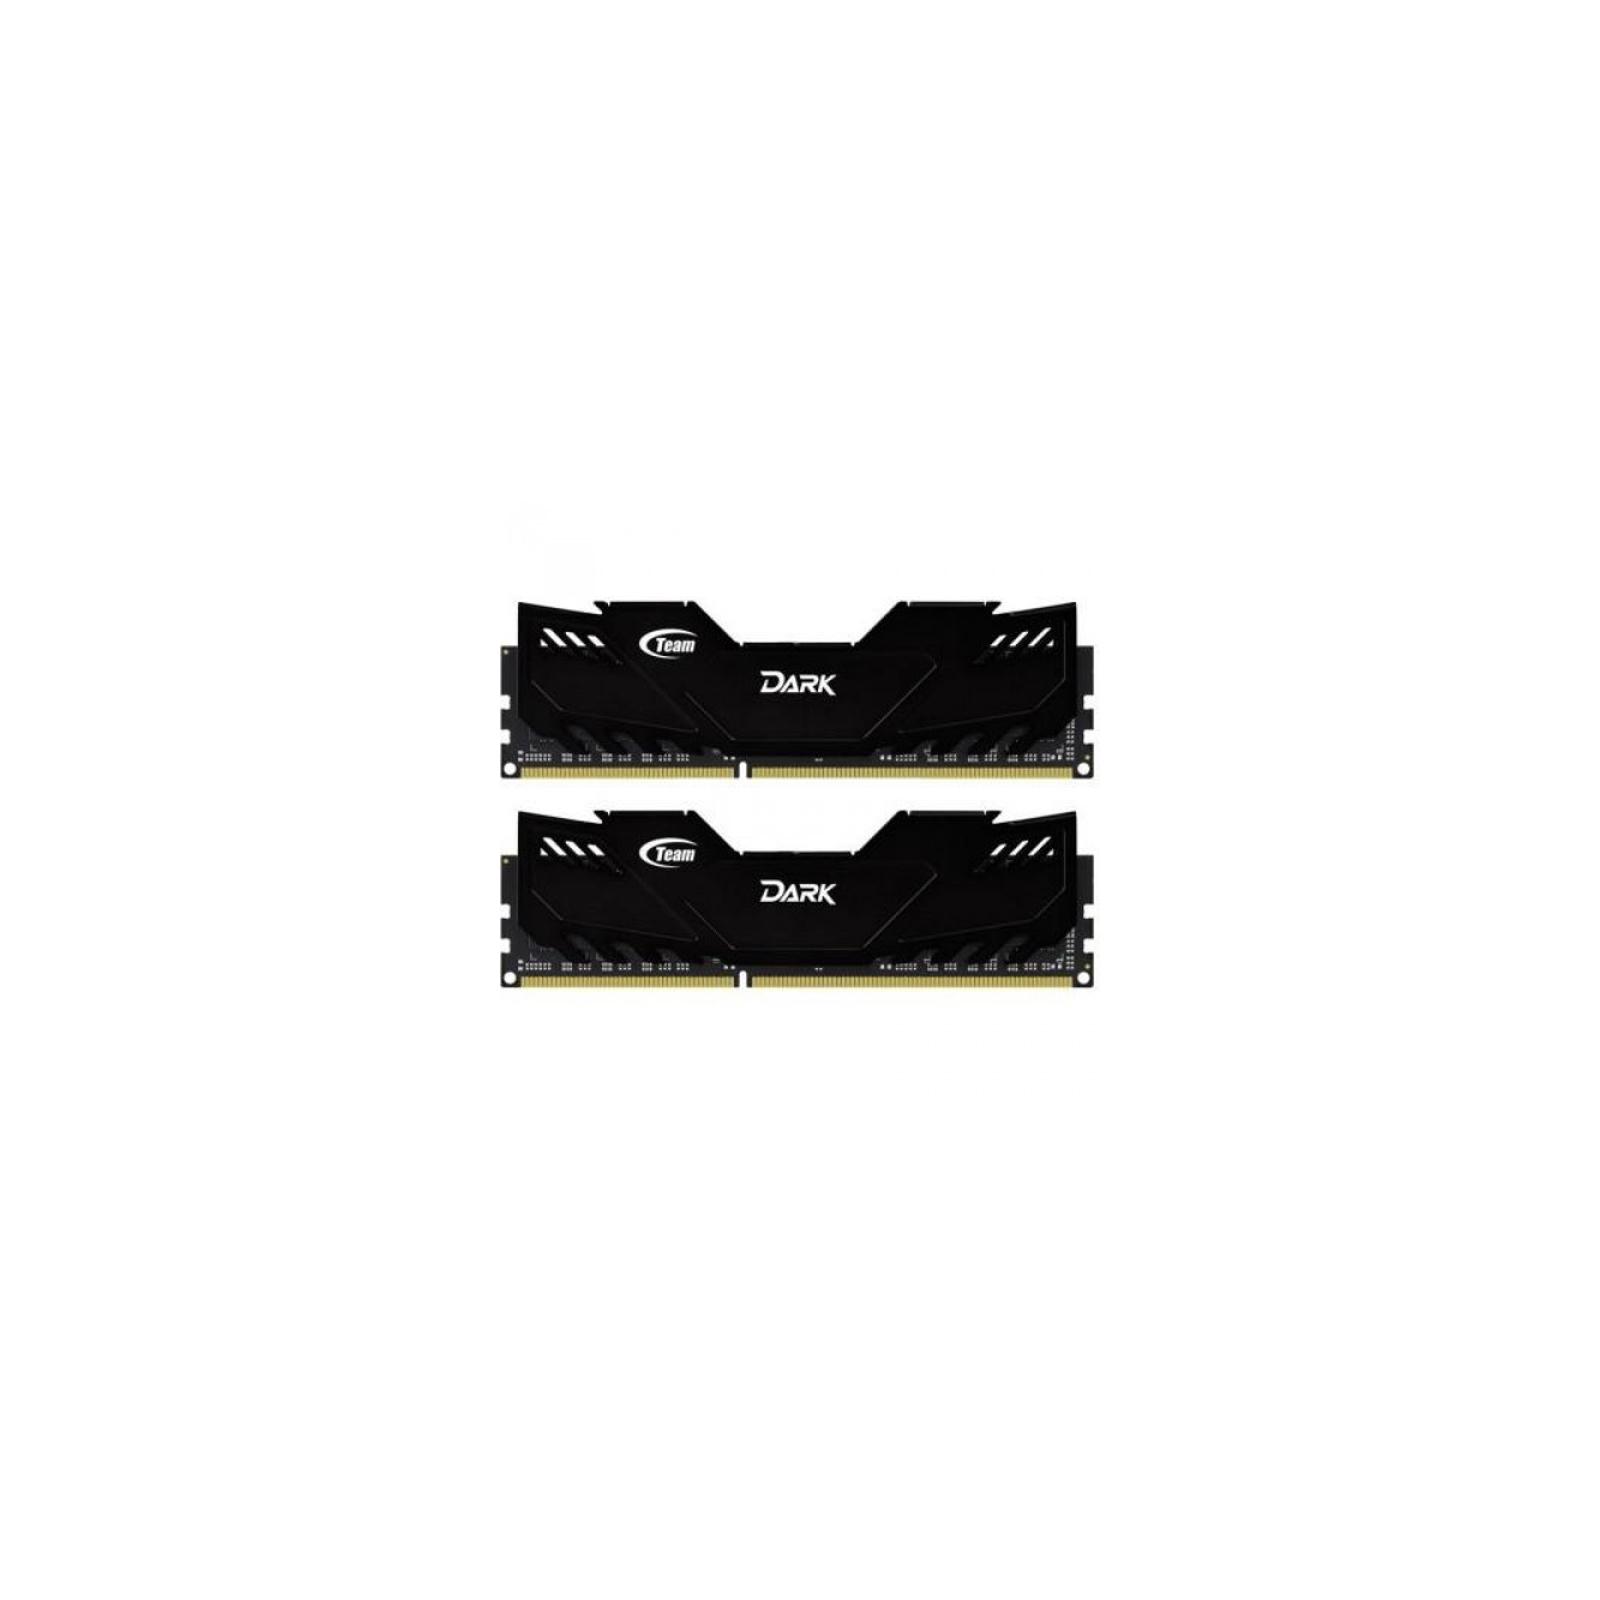 Модуль памяти для компьютера DDR4 16GB (2x8GB) 3000 MHz Dark Black Team (TDKED416G3000HC16ADC01)